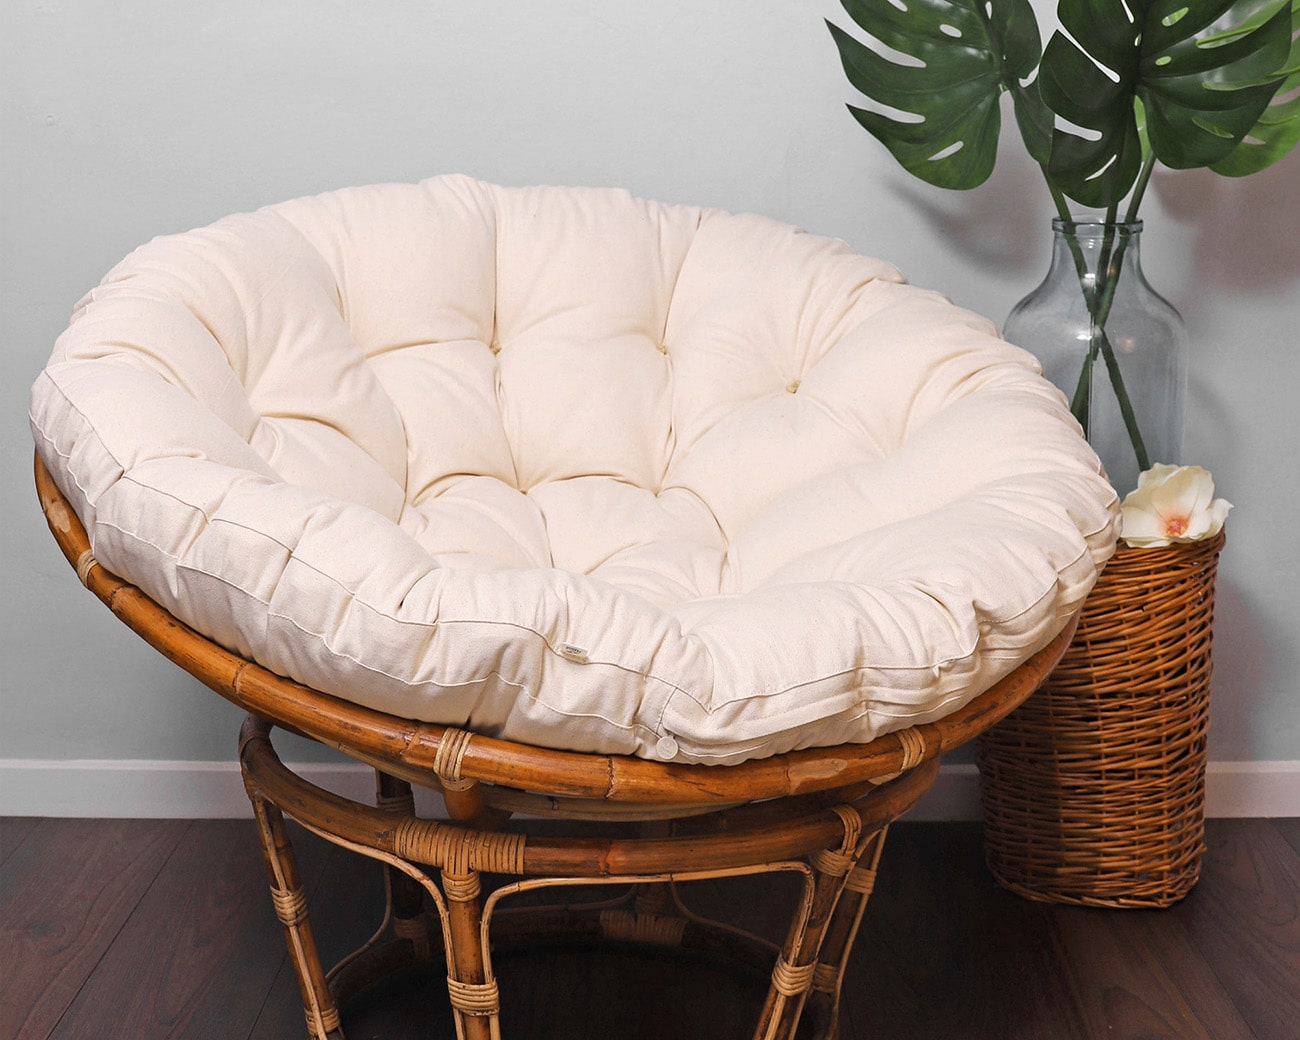 home of wool wool-filled papasan chair cushion